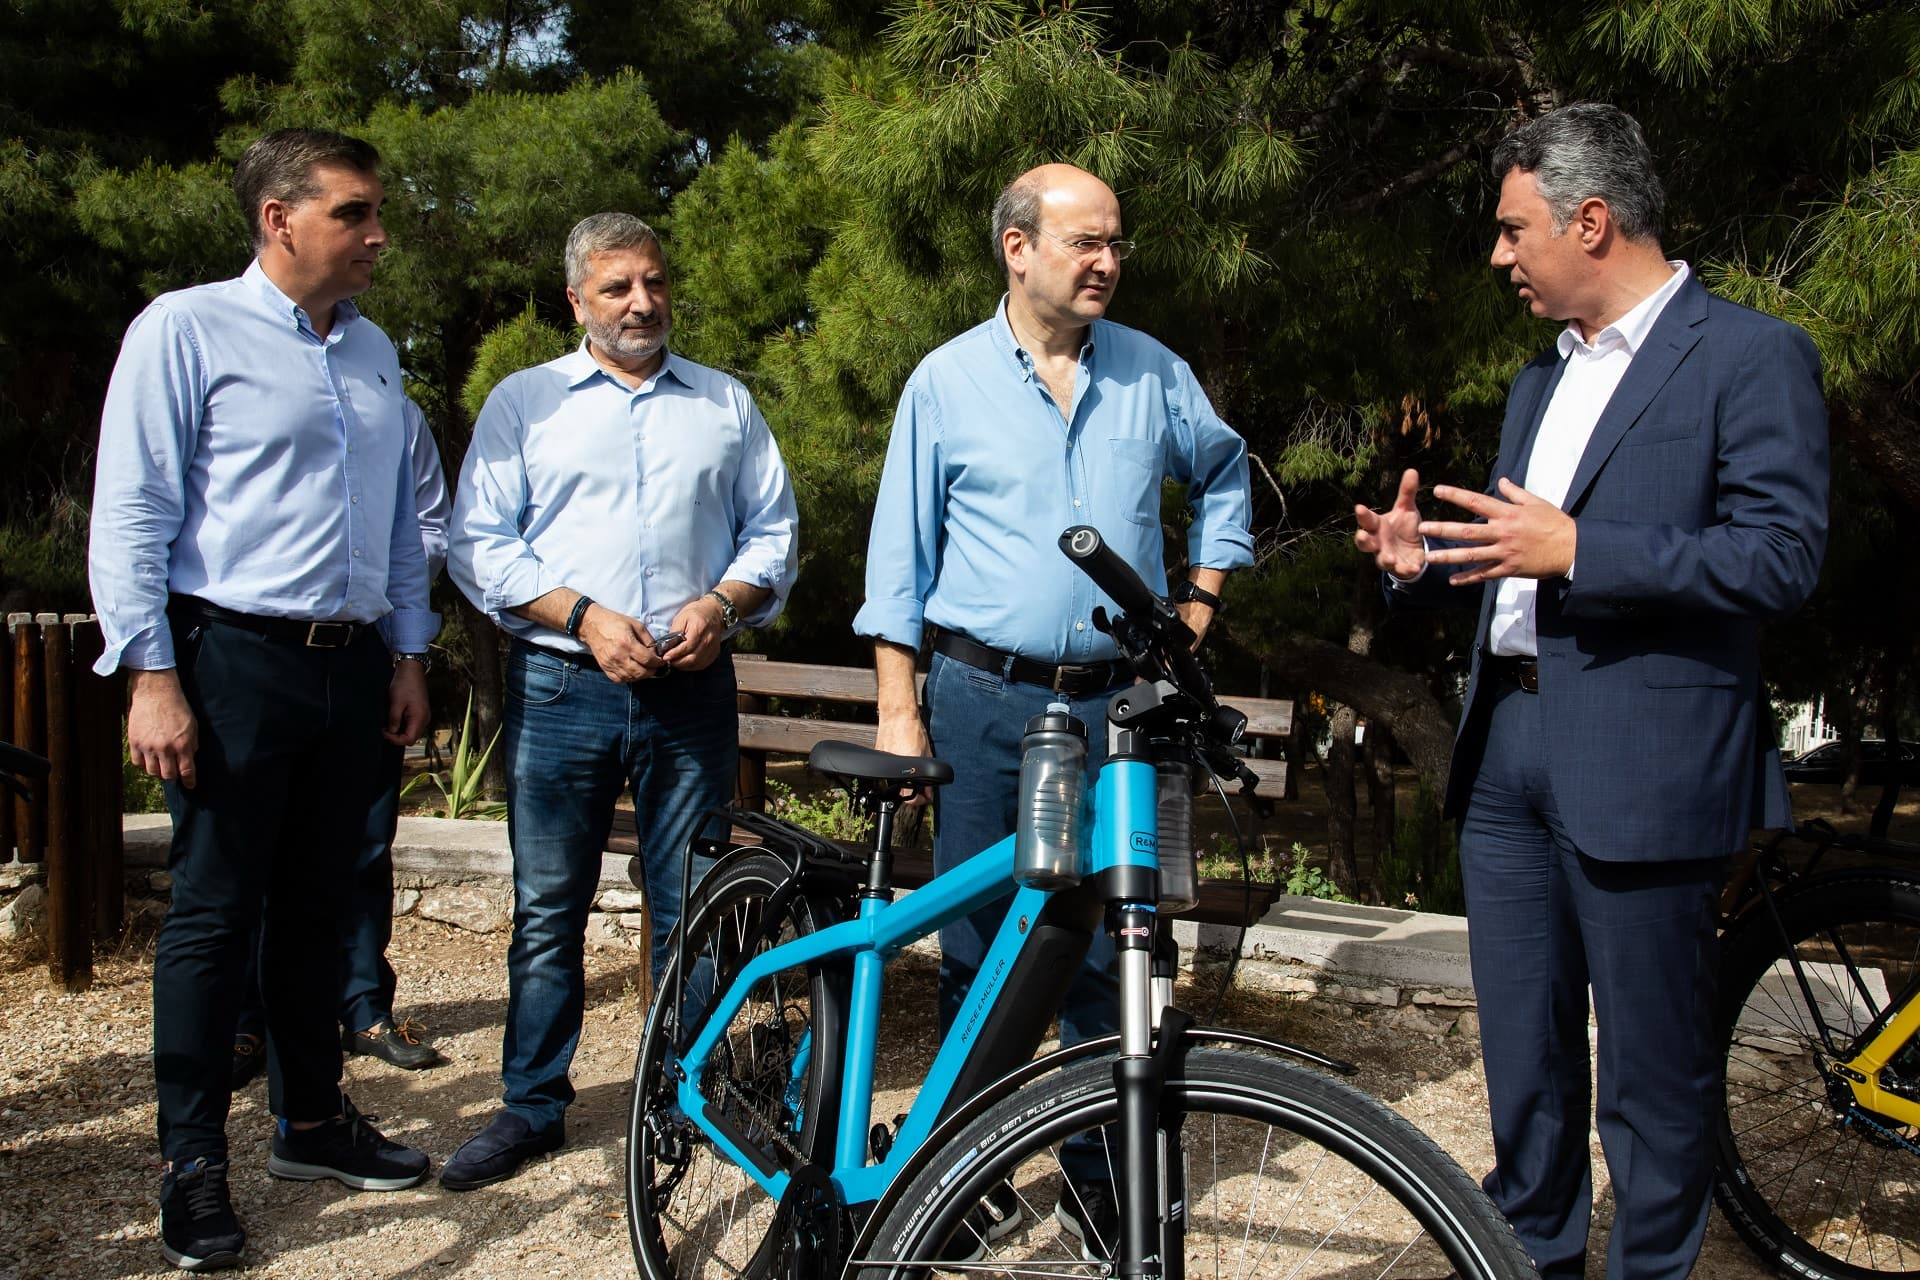 Kosmocar e-bikes - Γιάννης Κωνσταντάτος, Γιώργος Πατούλης, Κωστής Χατζηδάκης και Ανδρέας Χαλμπές στην εκδήλωση για το μνημόνιο συνεργασίας ΥΠΕΝ - ΣΠΑΥ